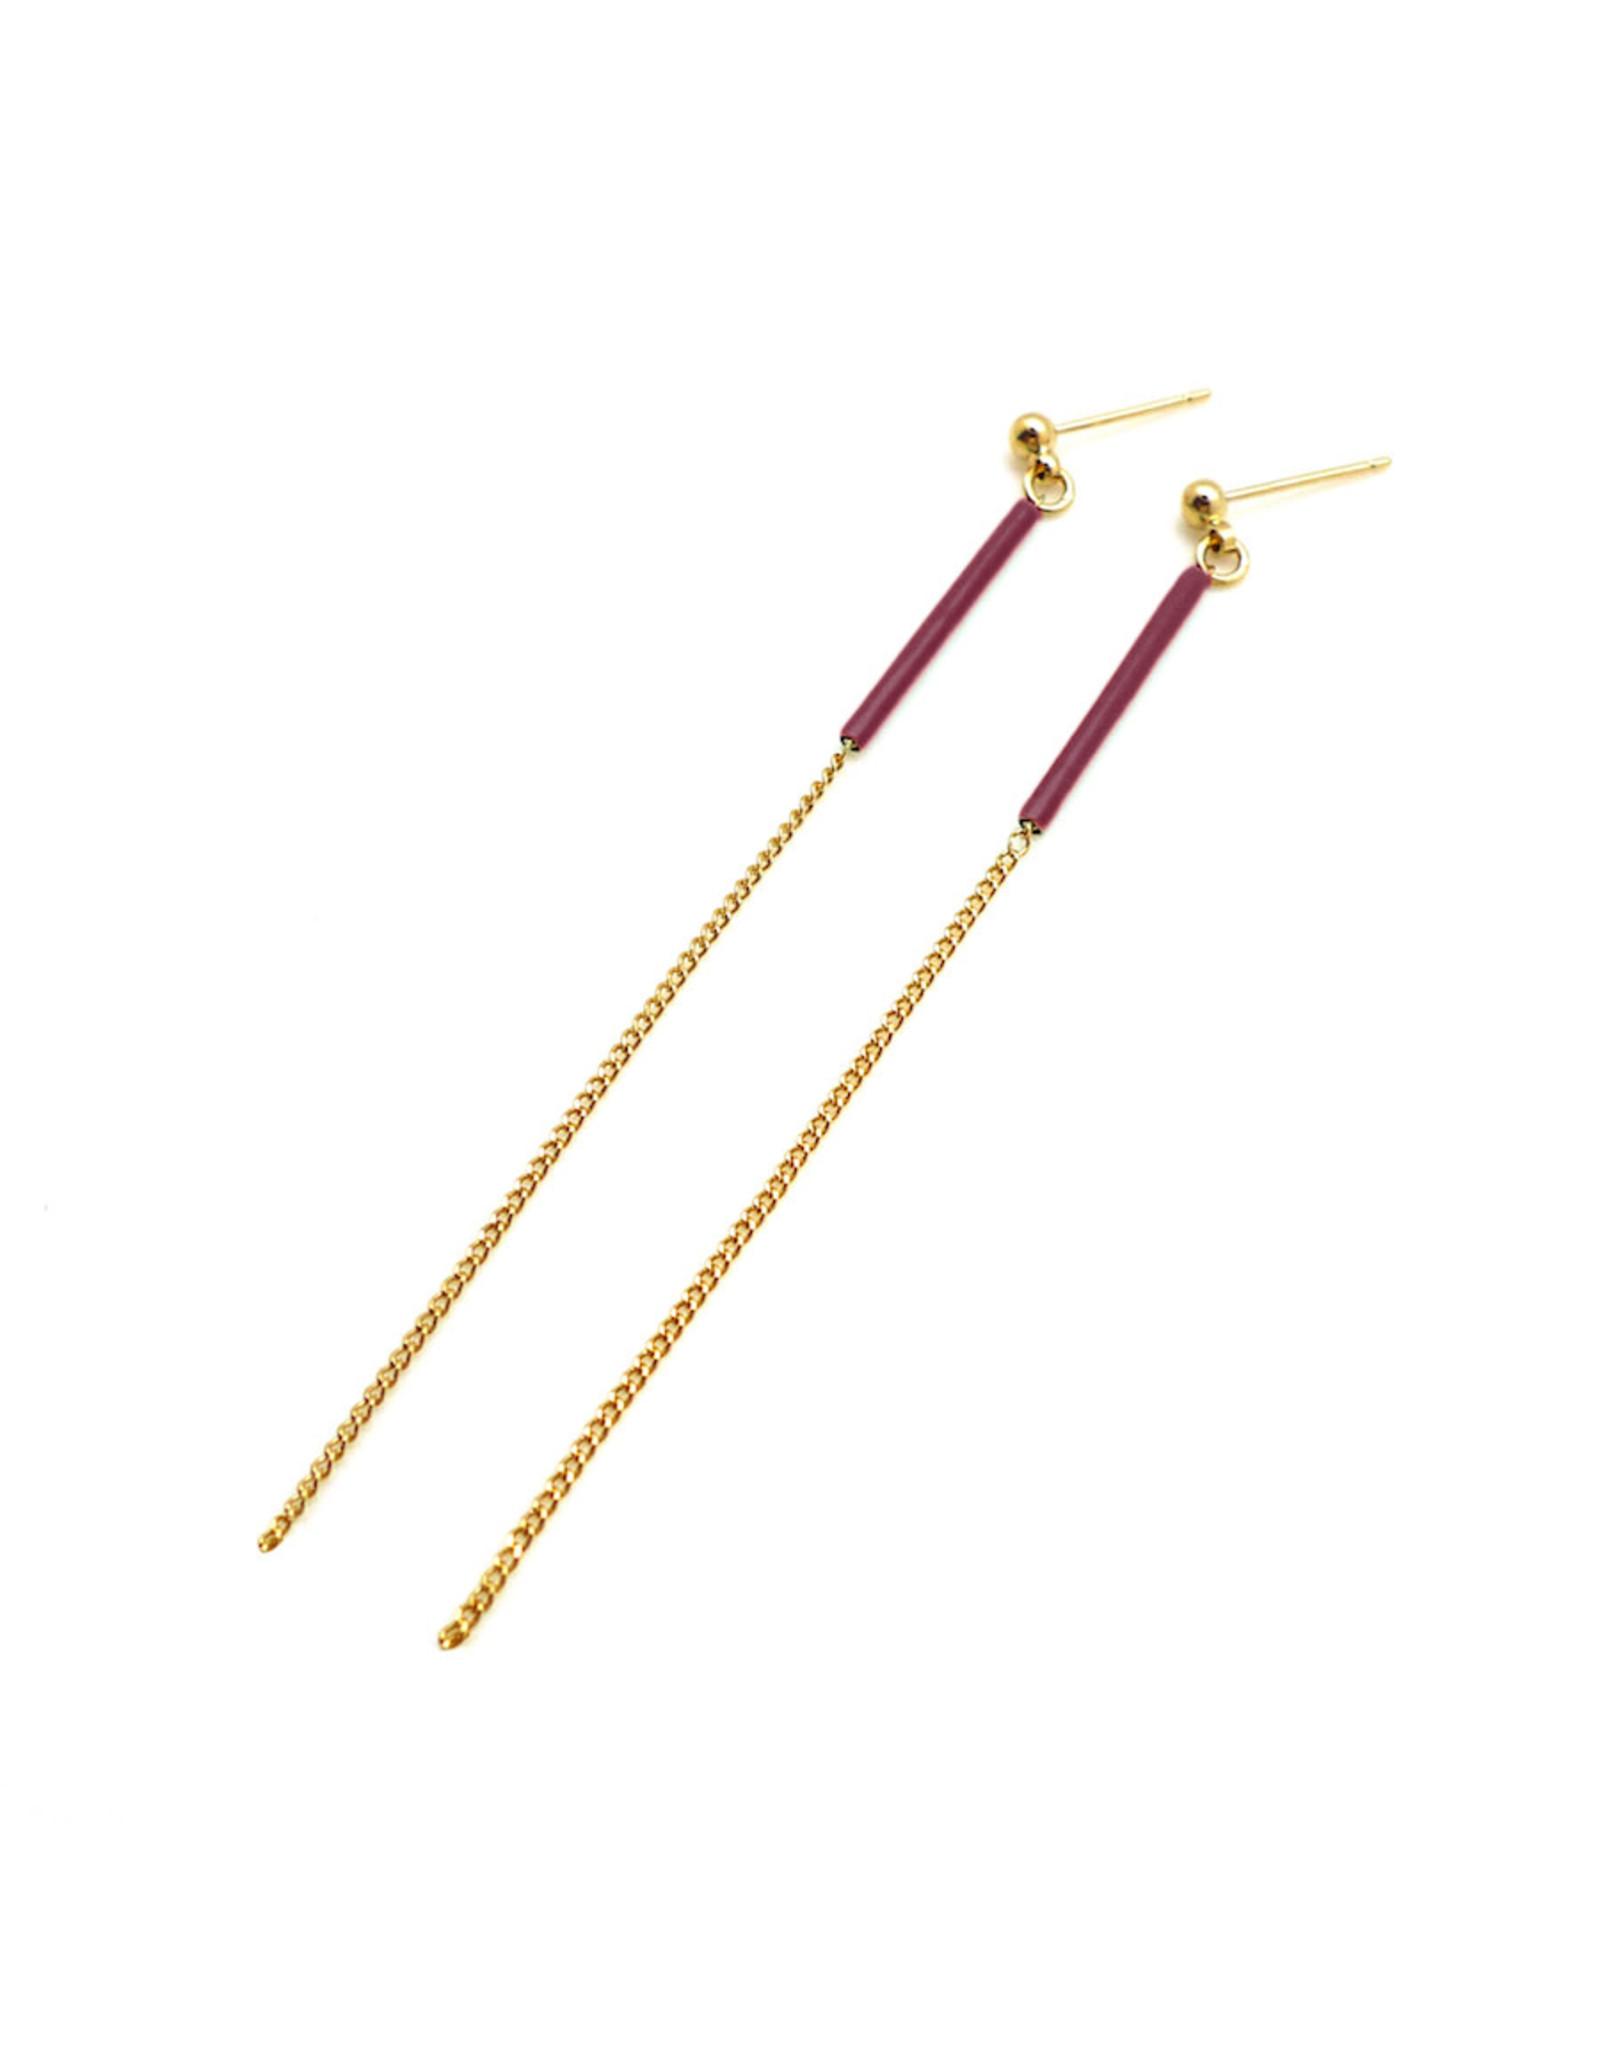 Nadja Carlotti Earrings Sparkle Burgundy